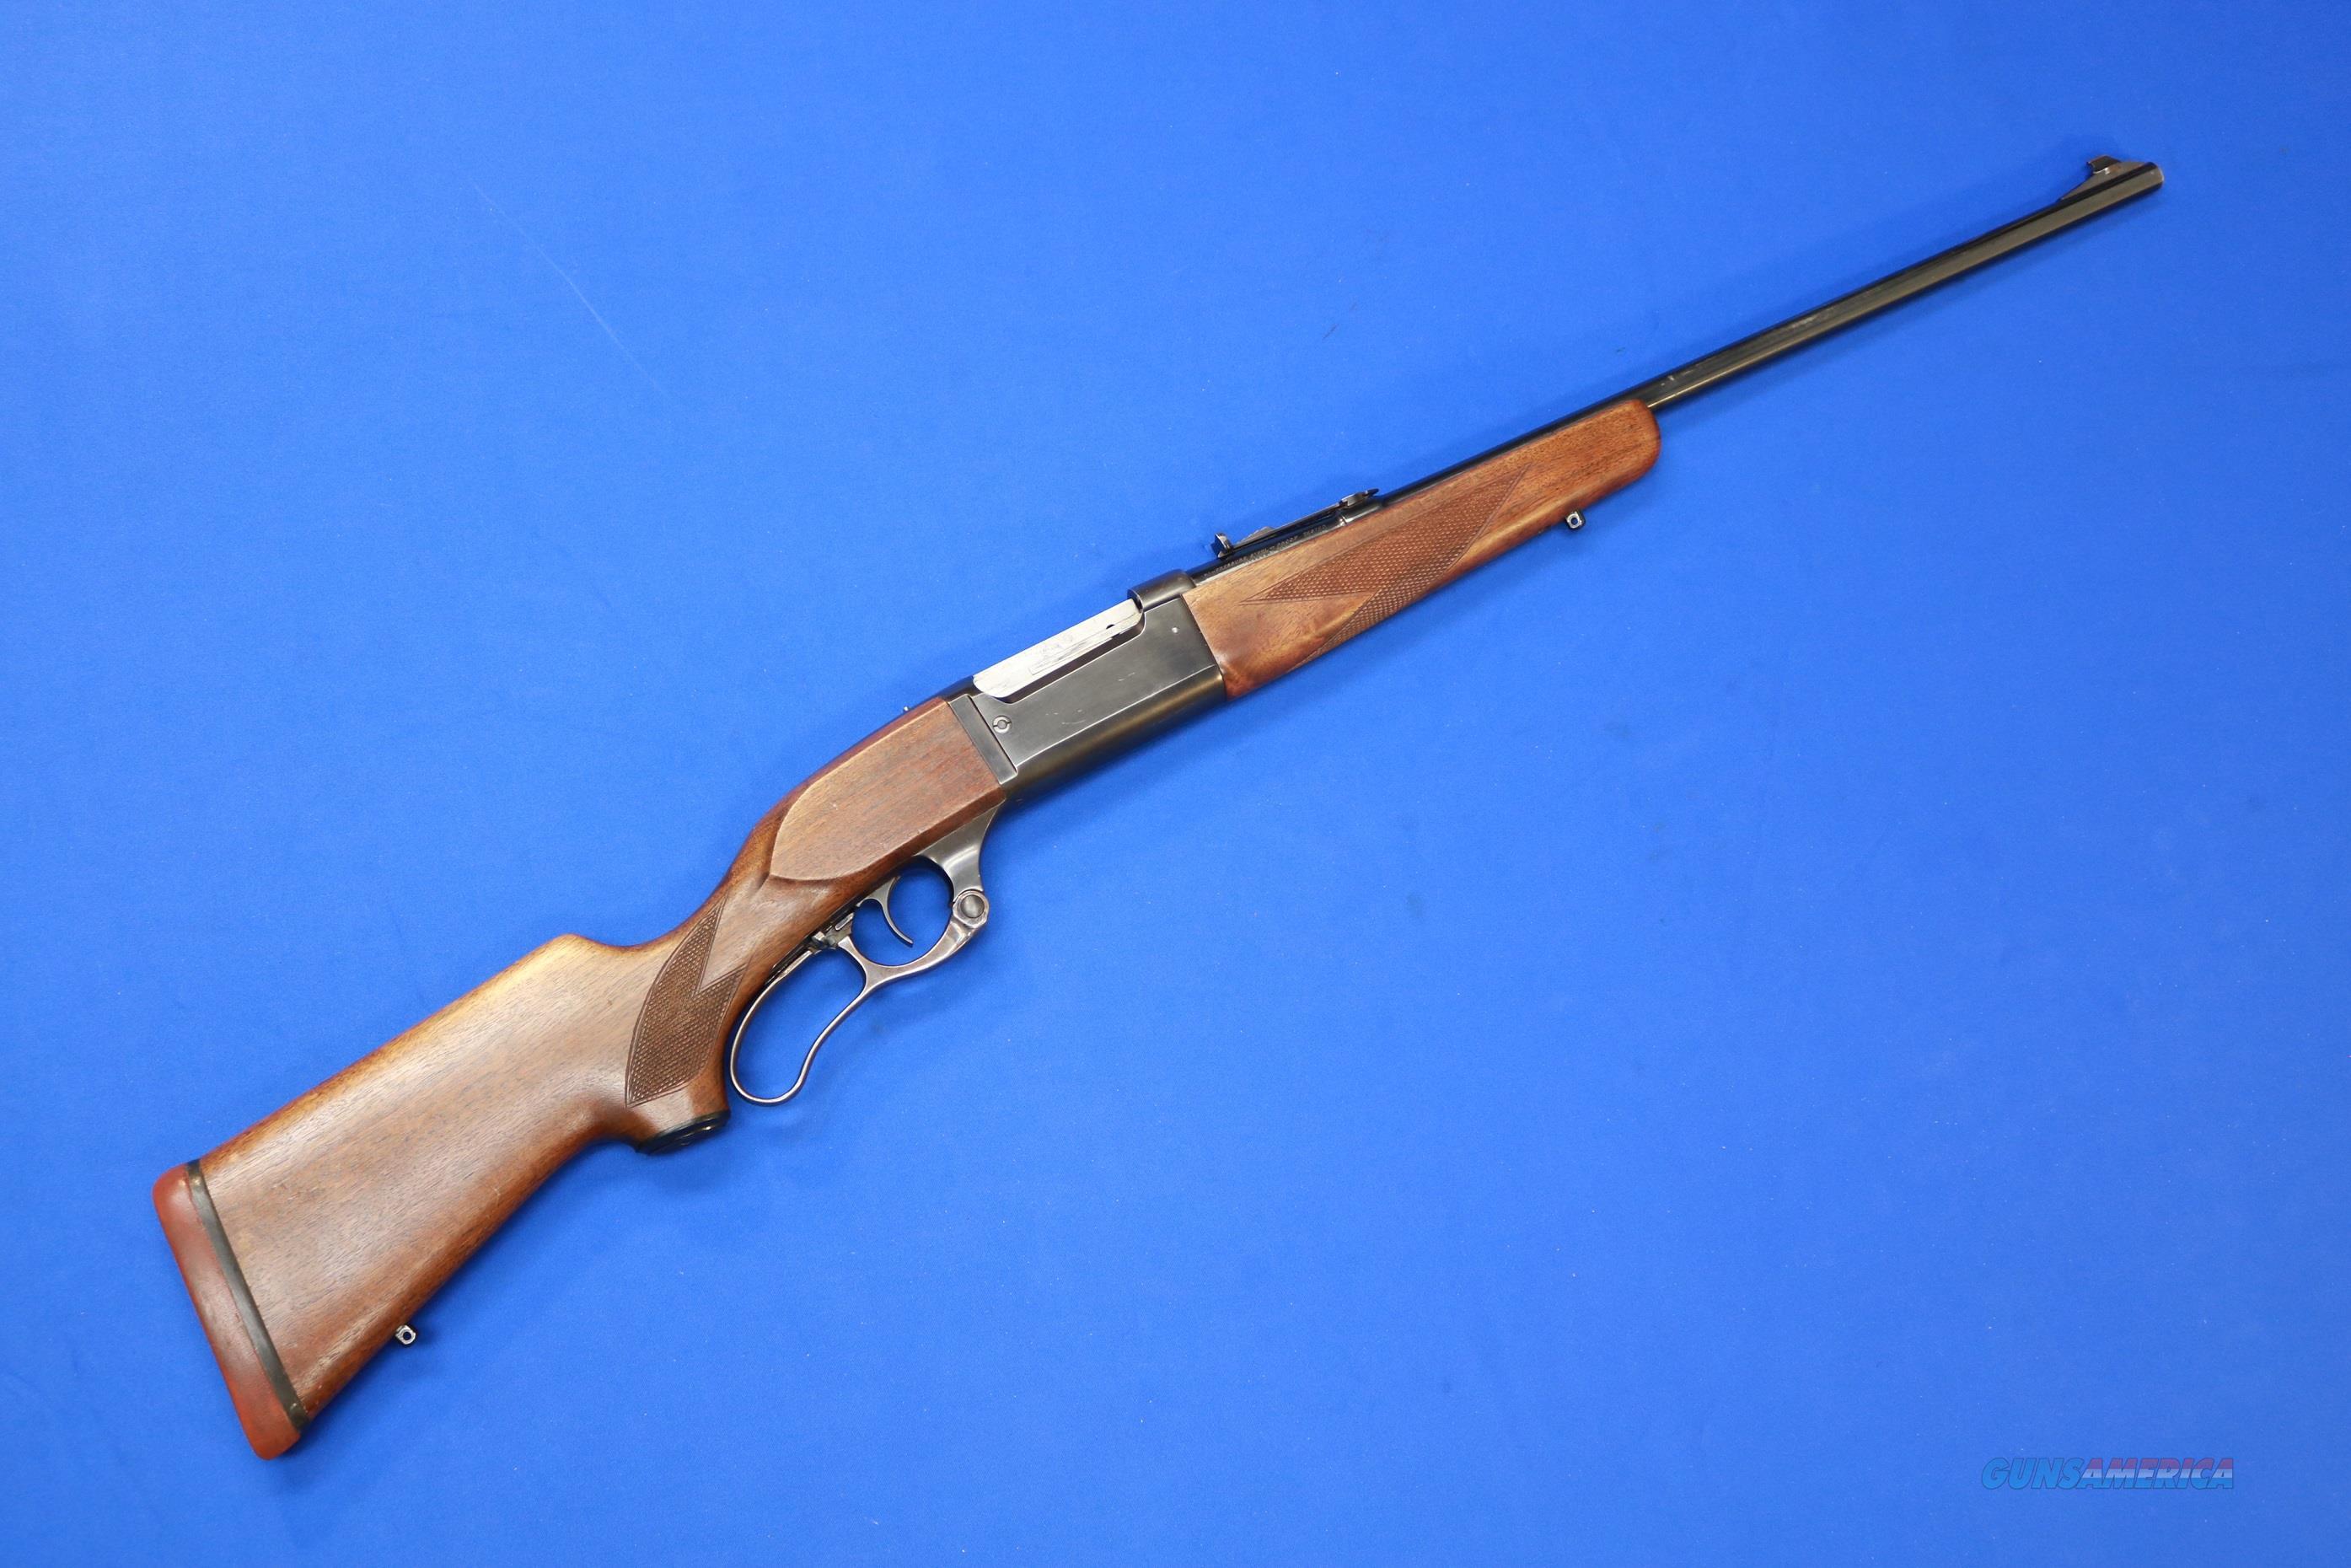 SAVAGE 99F LEVER ACTION .250-3000 SAVAGE   Guns > Rifles > Savage Rifles > Model 95/99 Family